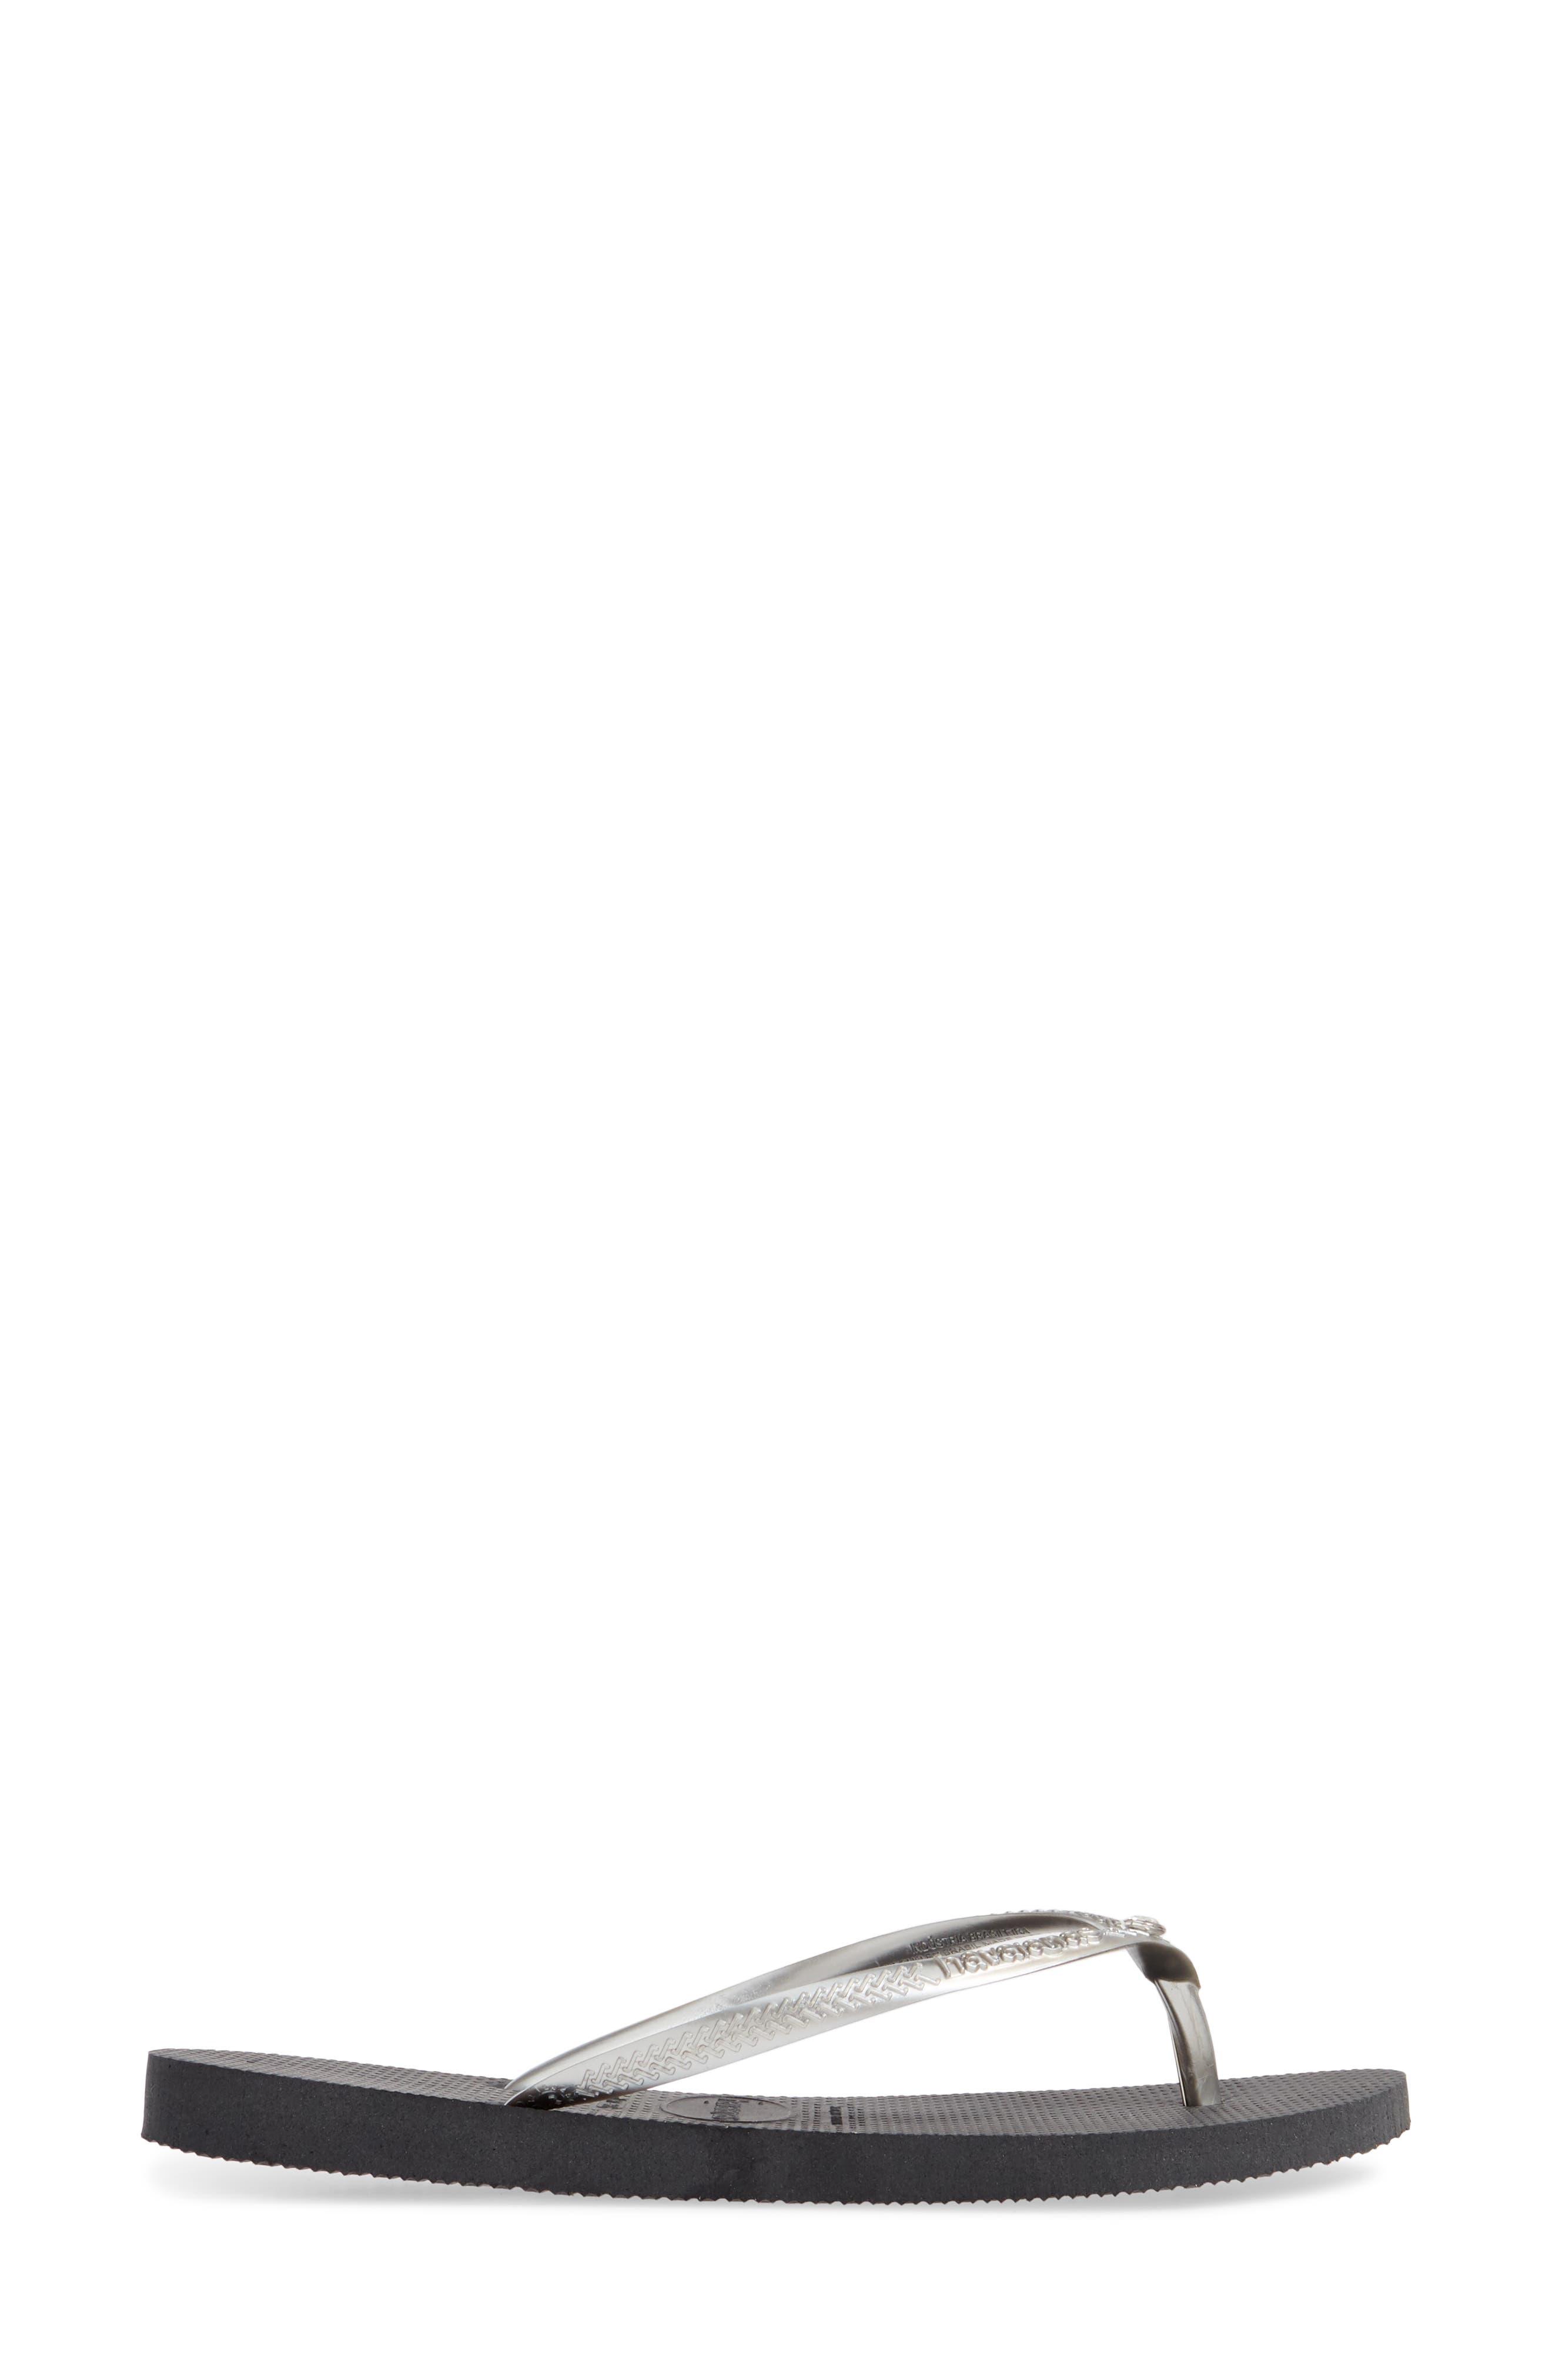 'Slim Crystal Glamour' Flip Flop,                             Alternate thumbnail 4, color,                             NEW GRAPHITE/ SILVER METALLIC